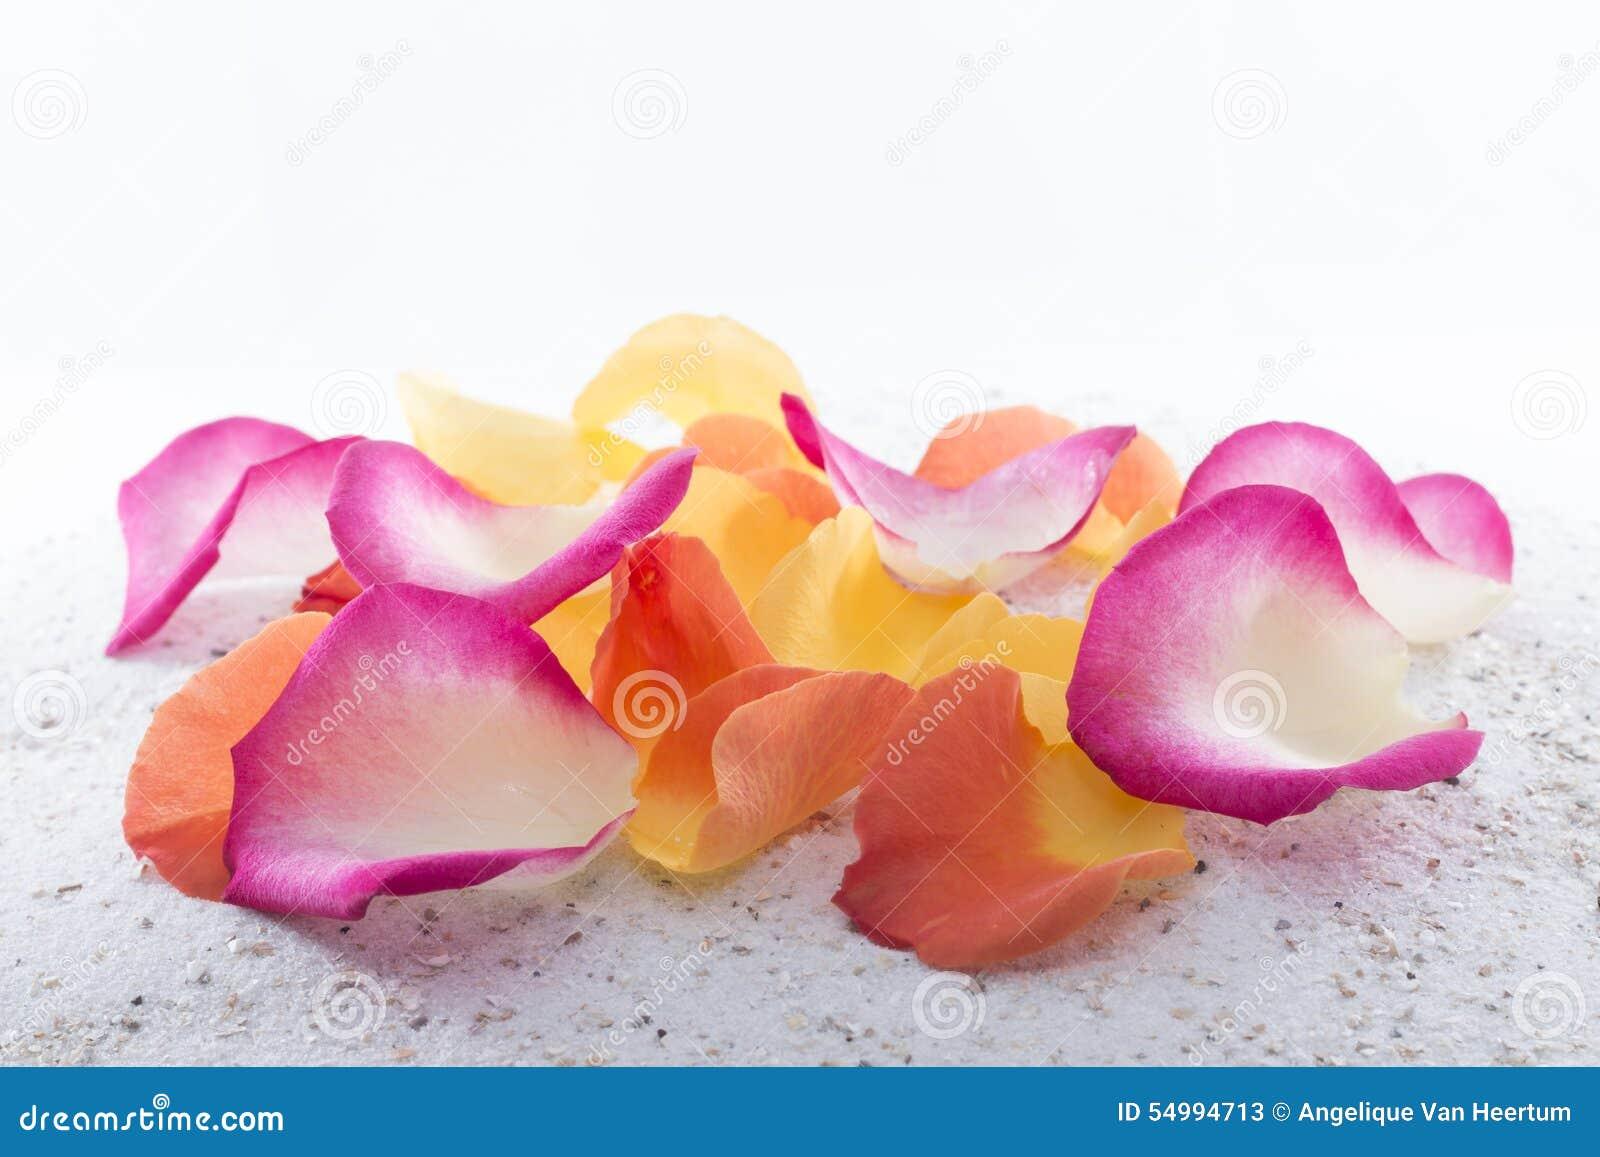 Rosafarbene Blumenblätter